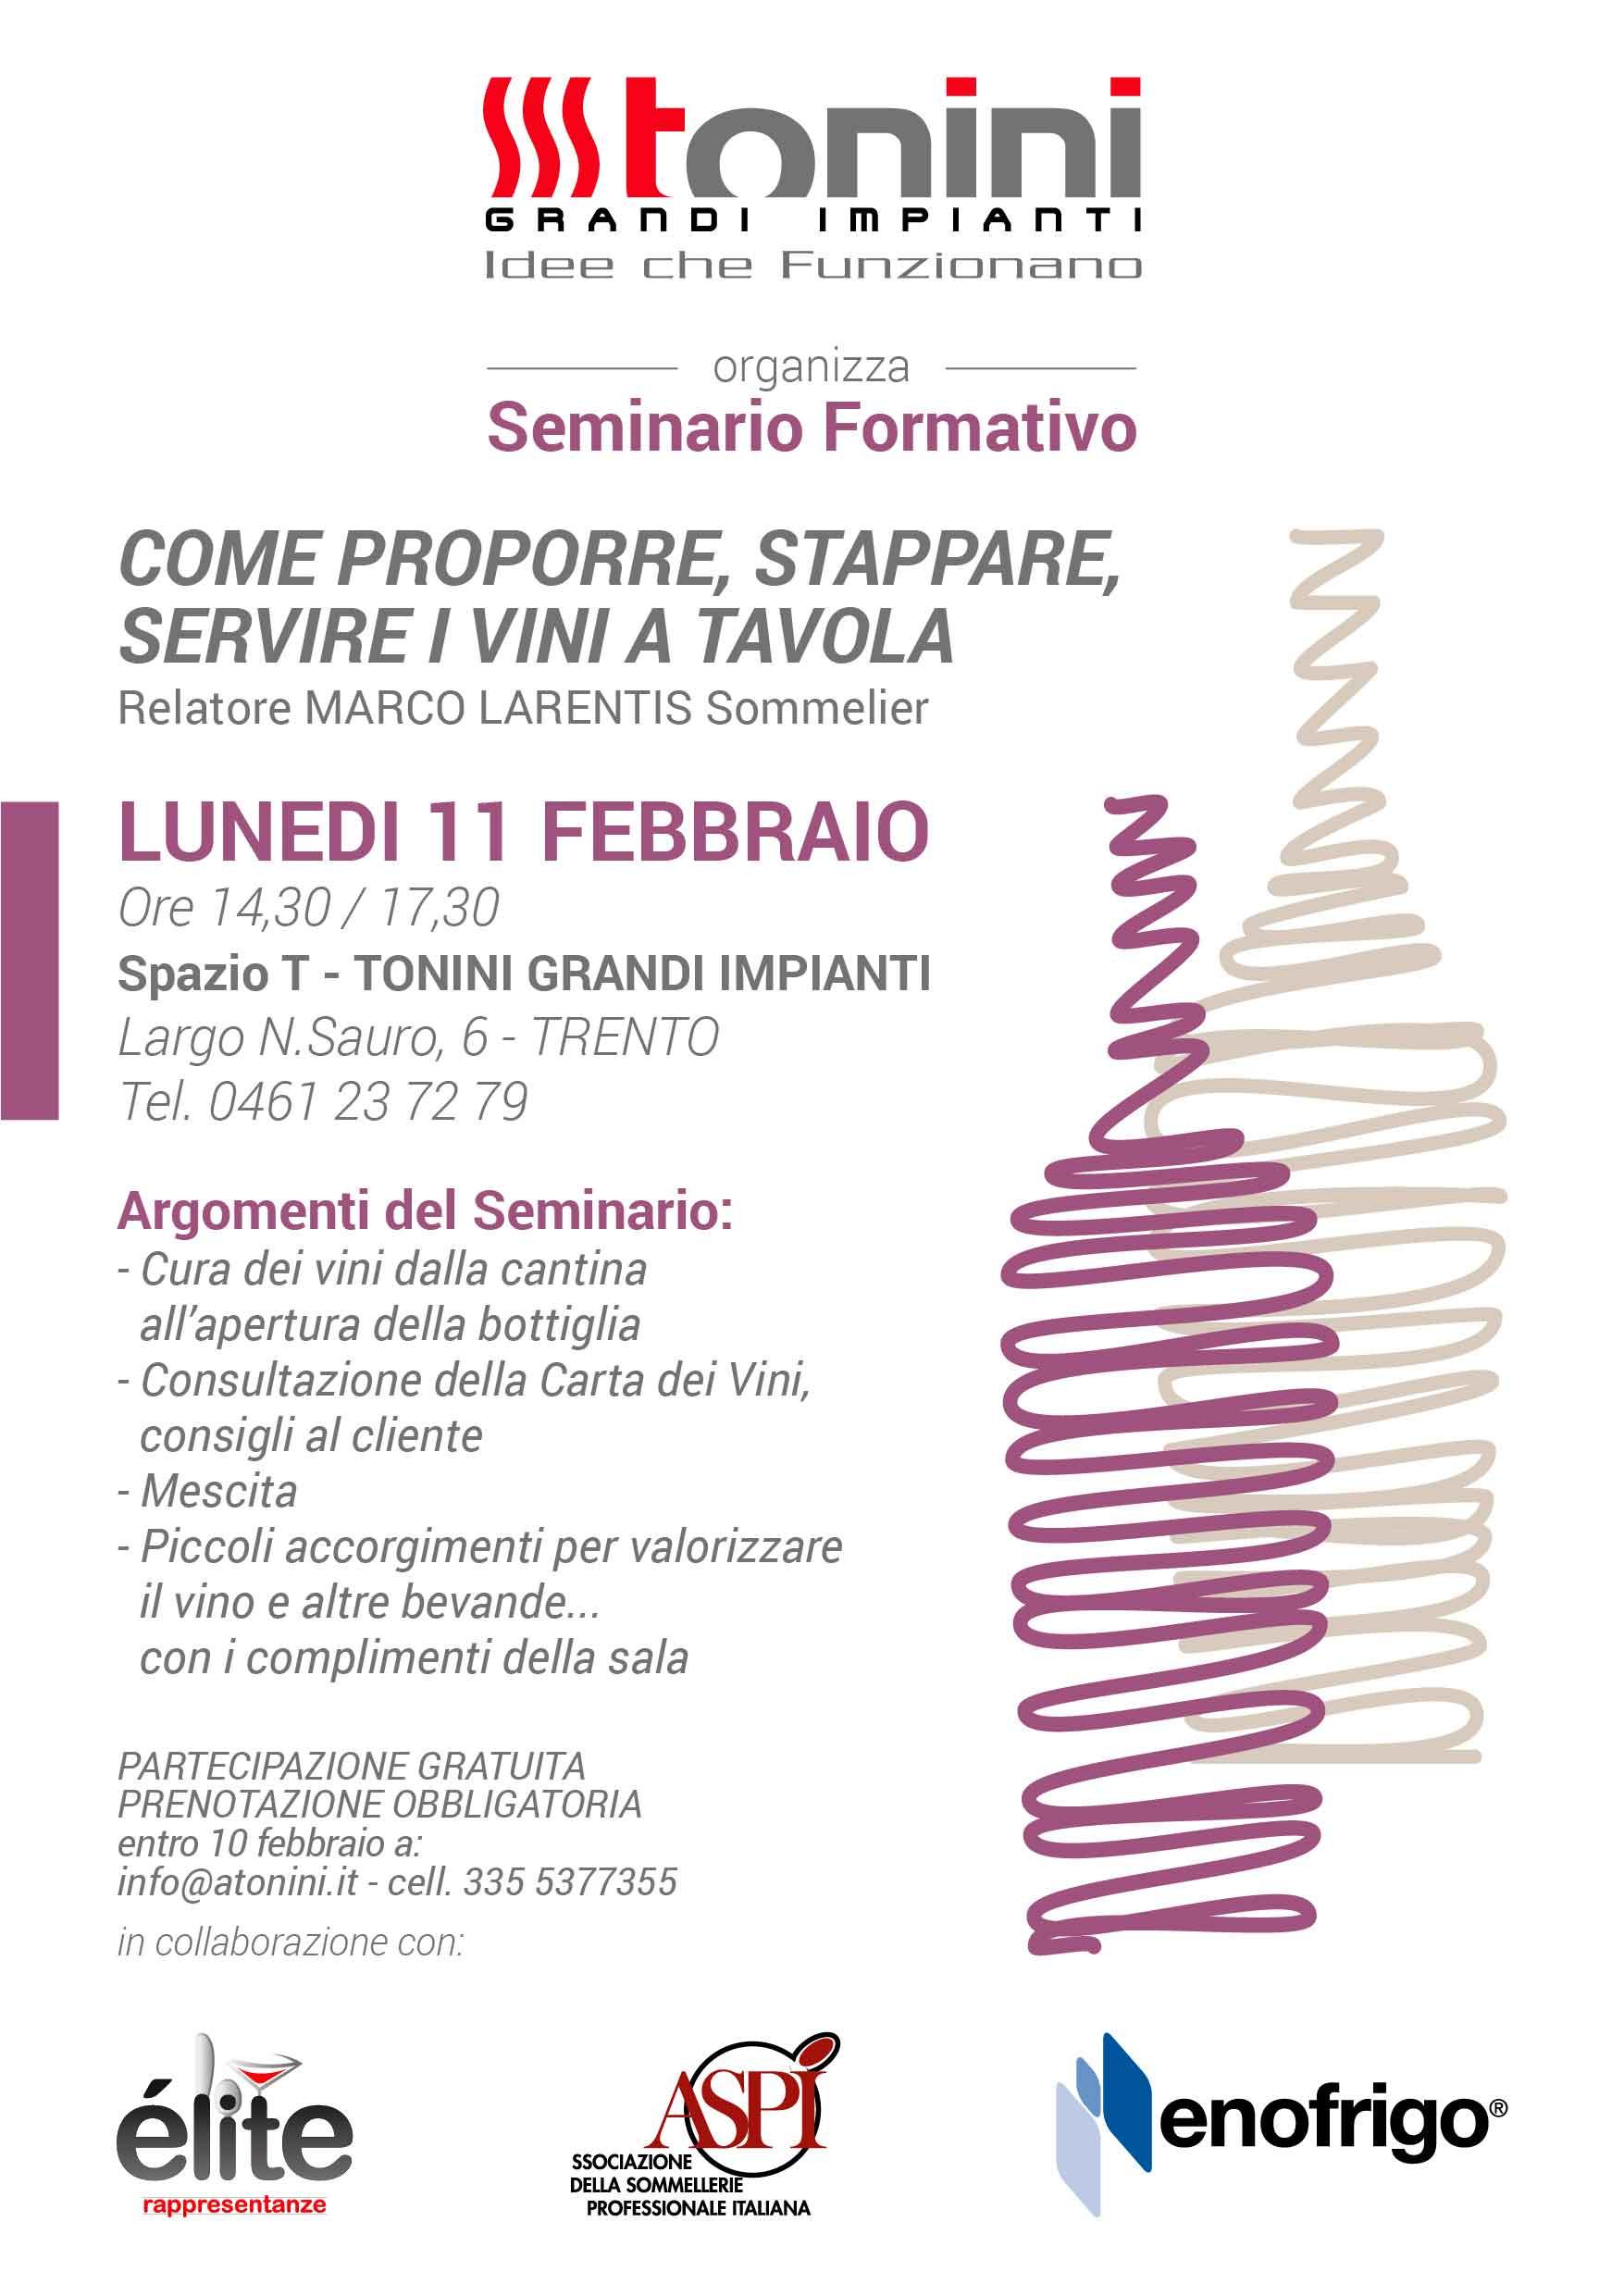 Locandina evento seminario formativo mescita vino